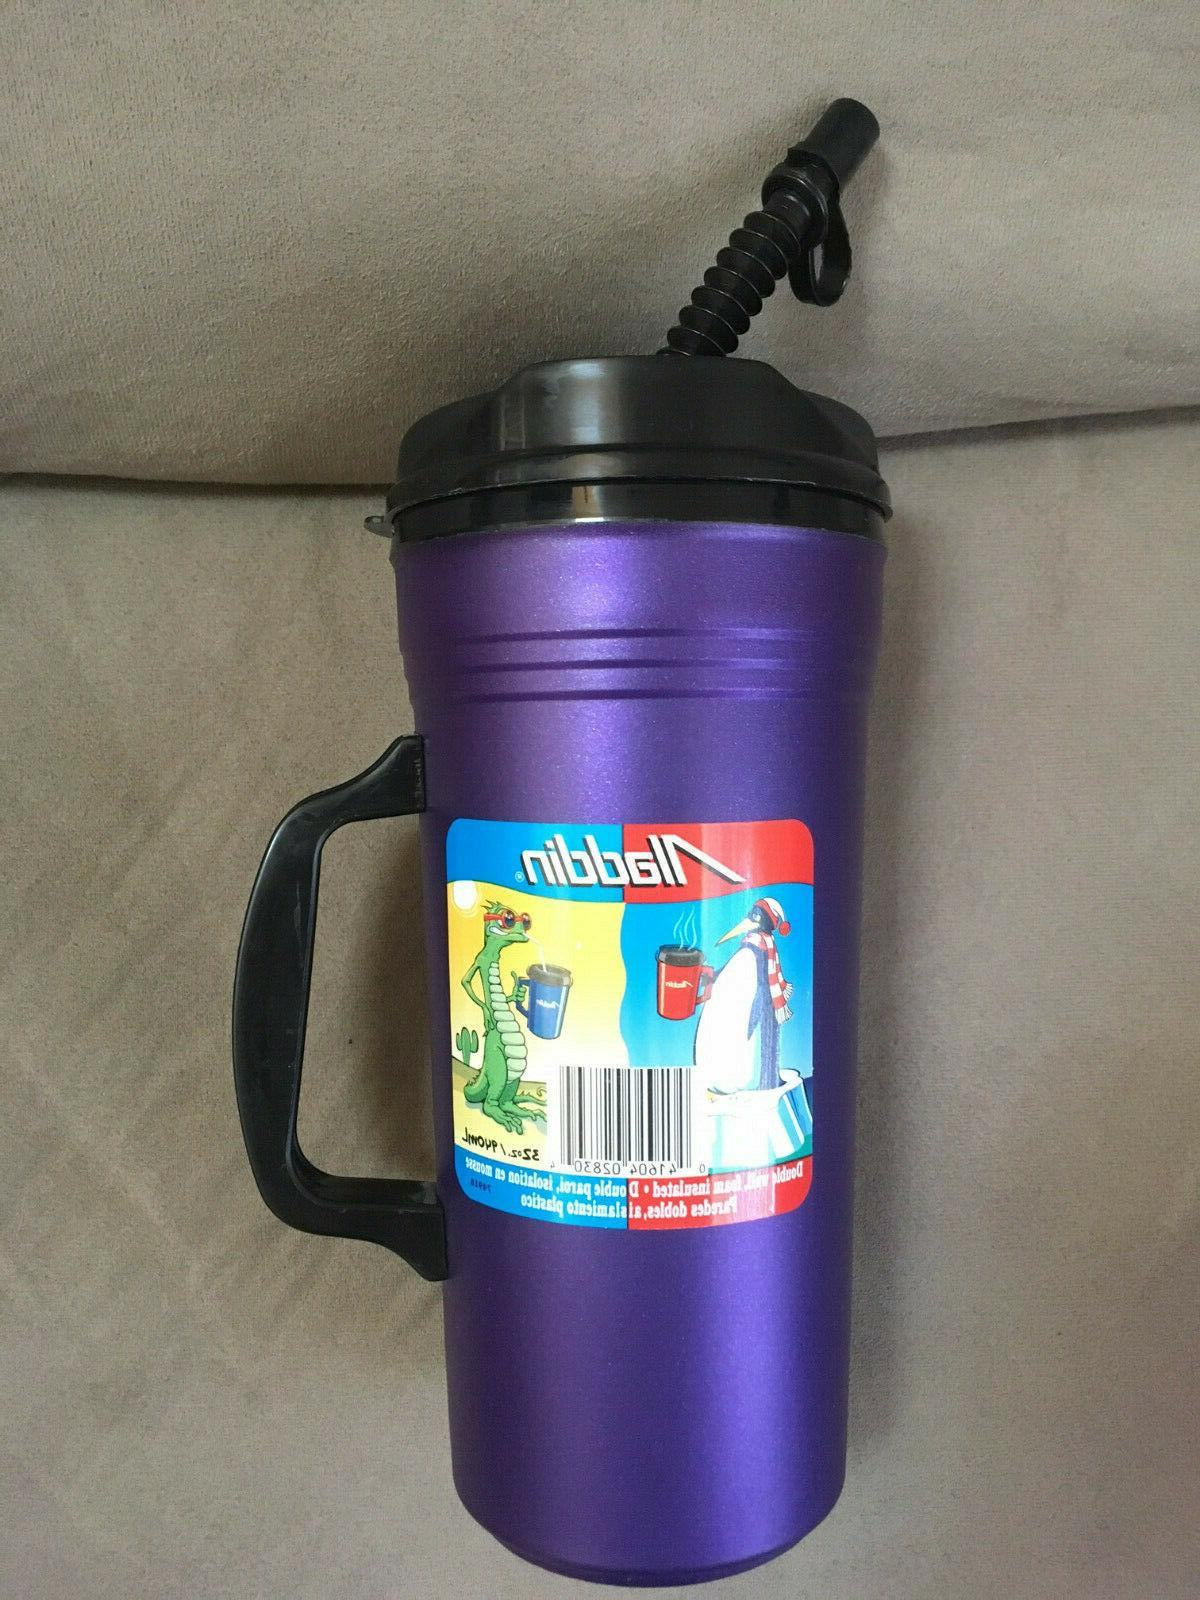 32oz insulated travel coffee mug cup tumbler